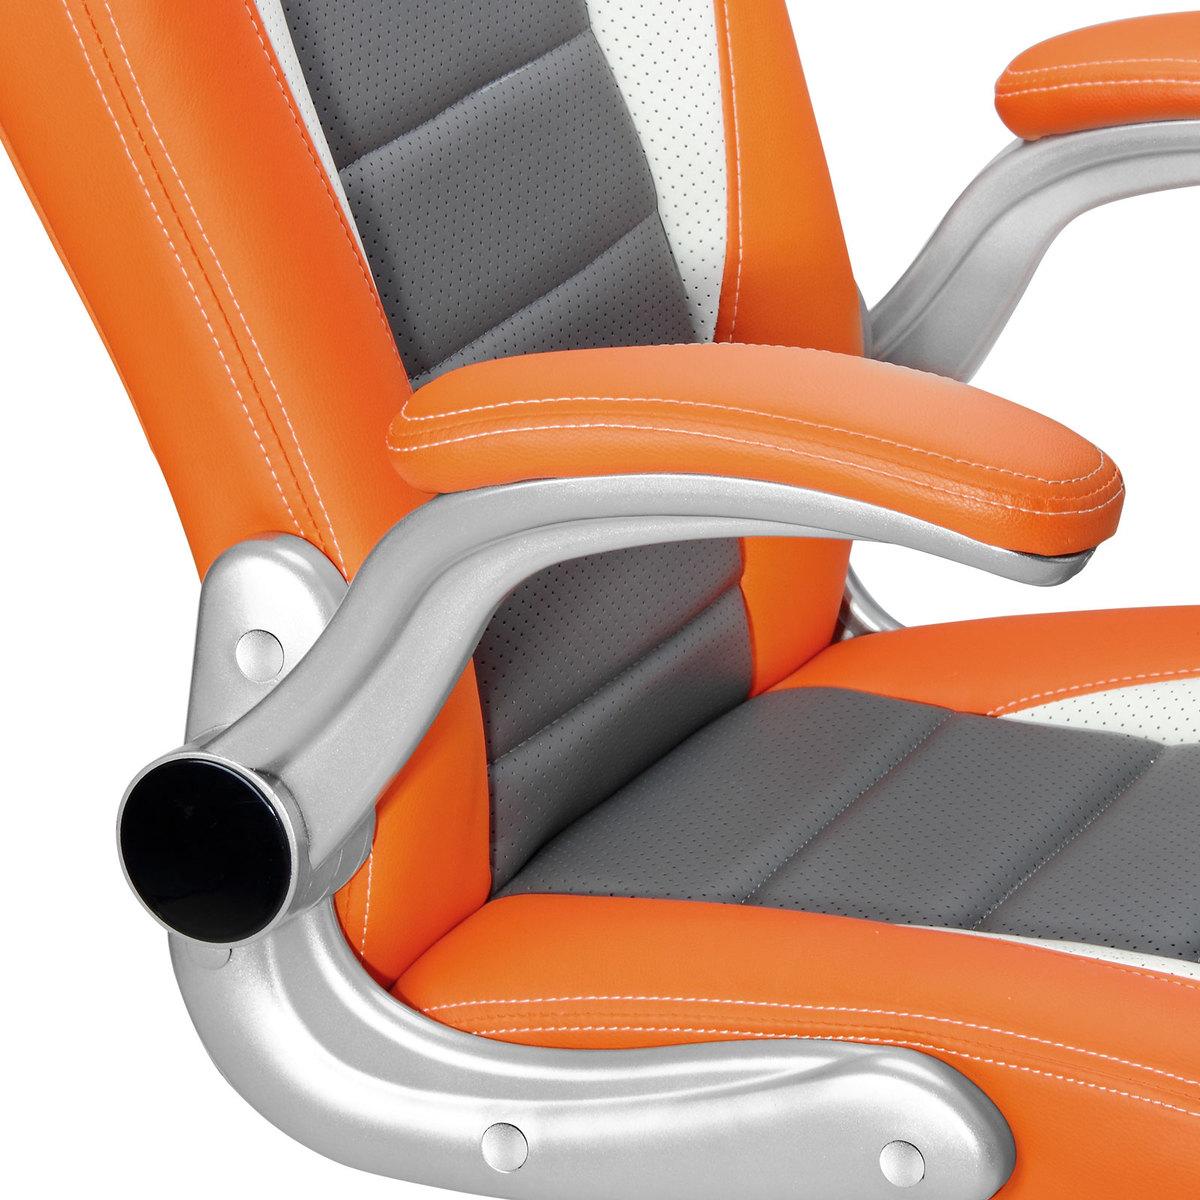 Bild 5 von Deuba Bürostuhl Sportsitz grau/orange